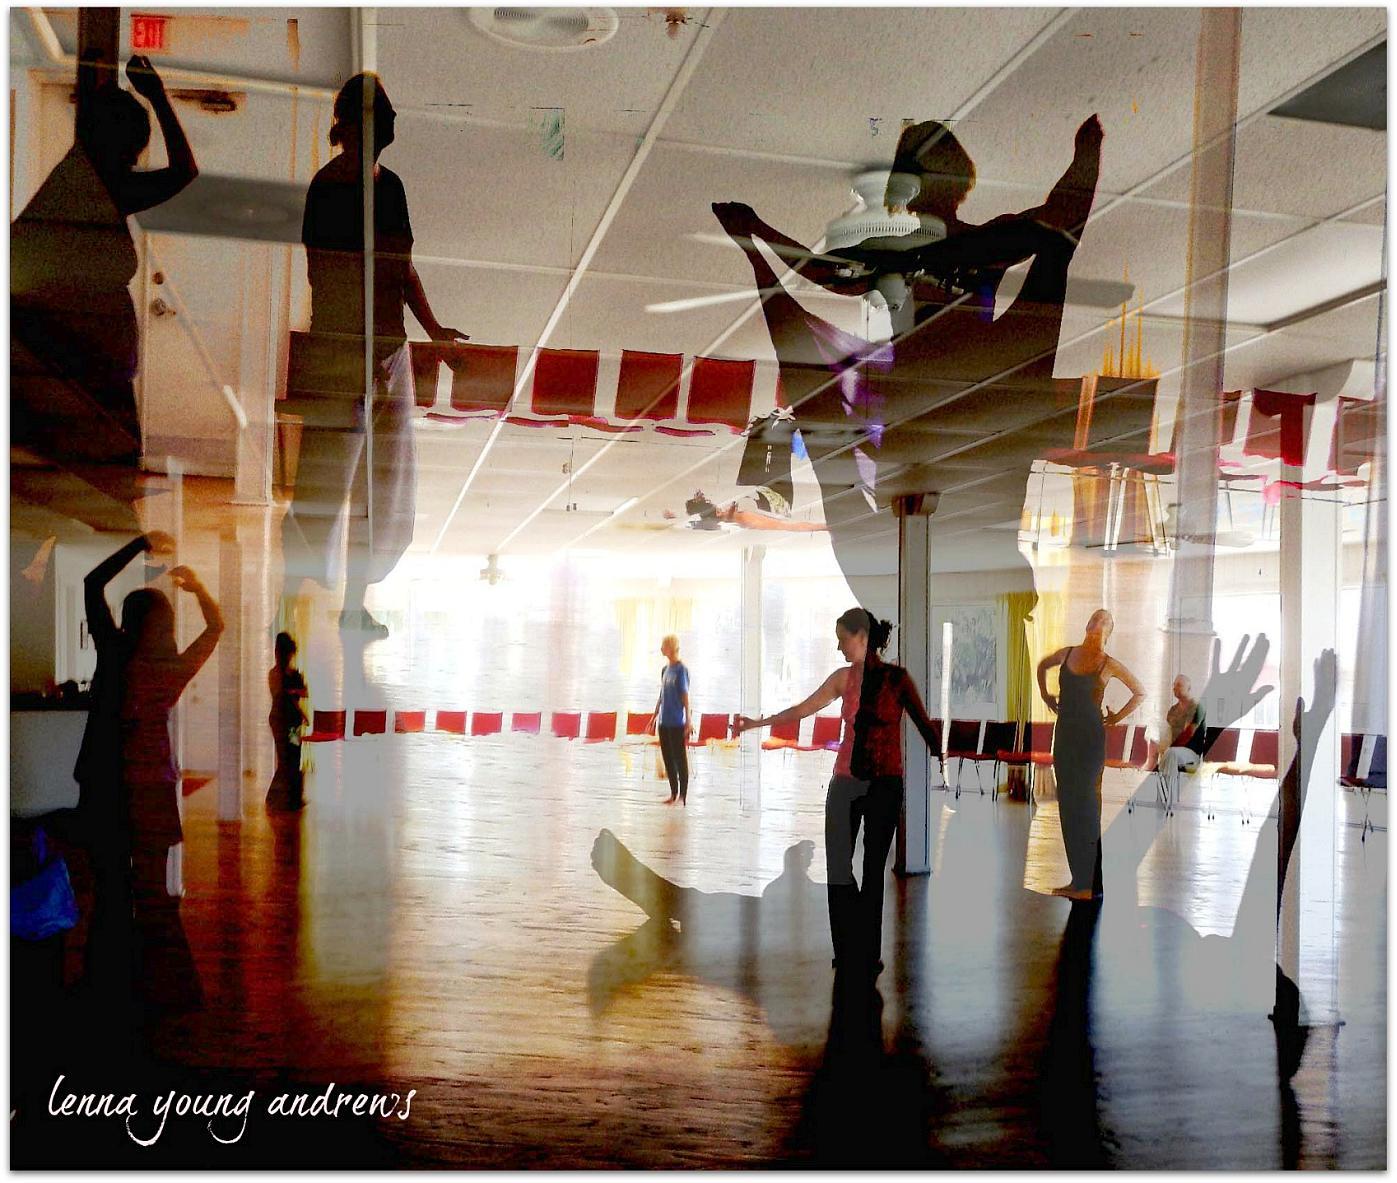 2011-12-04 conscious movement9.jpg